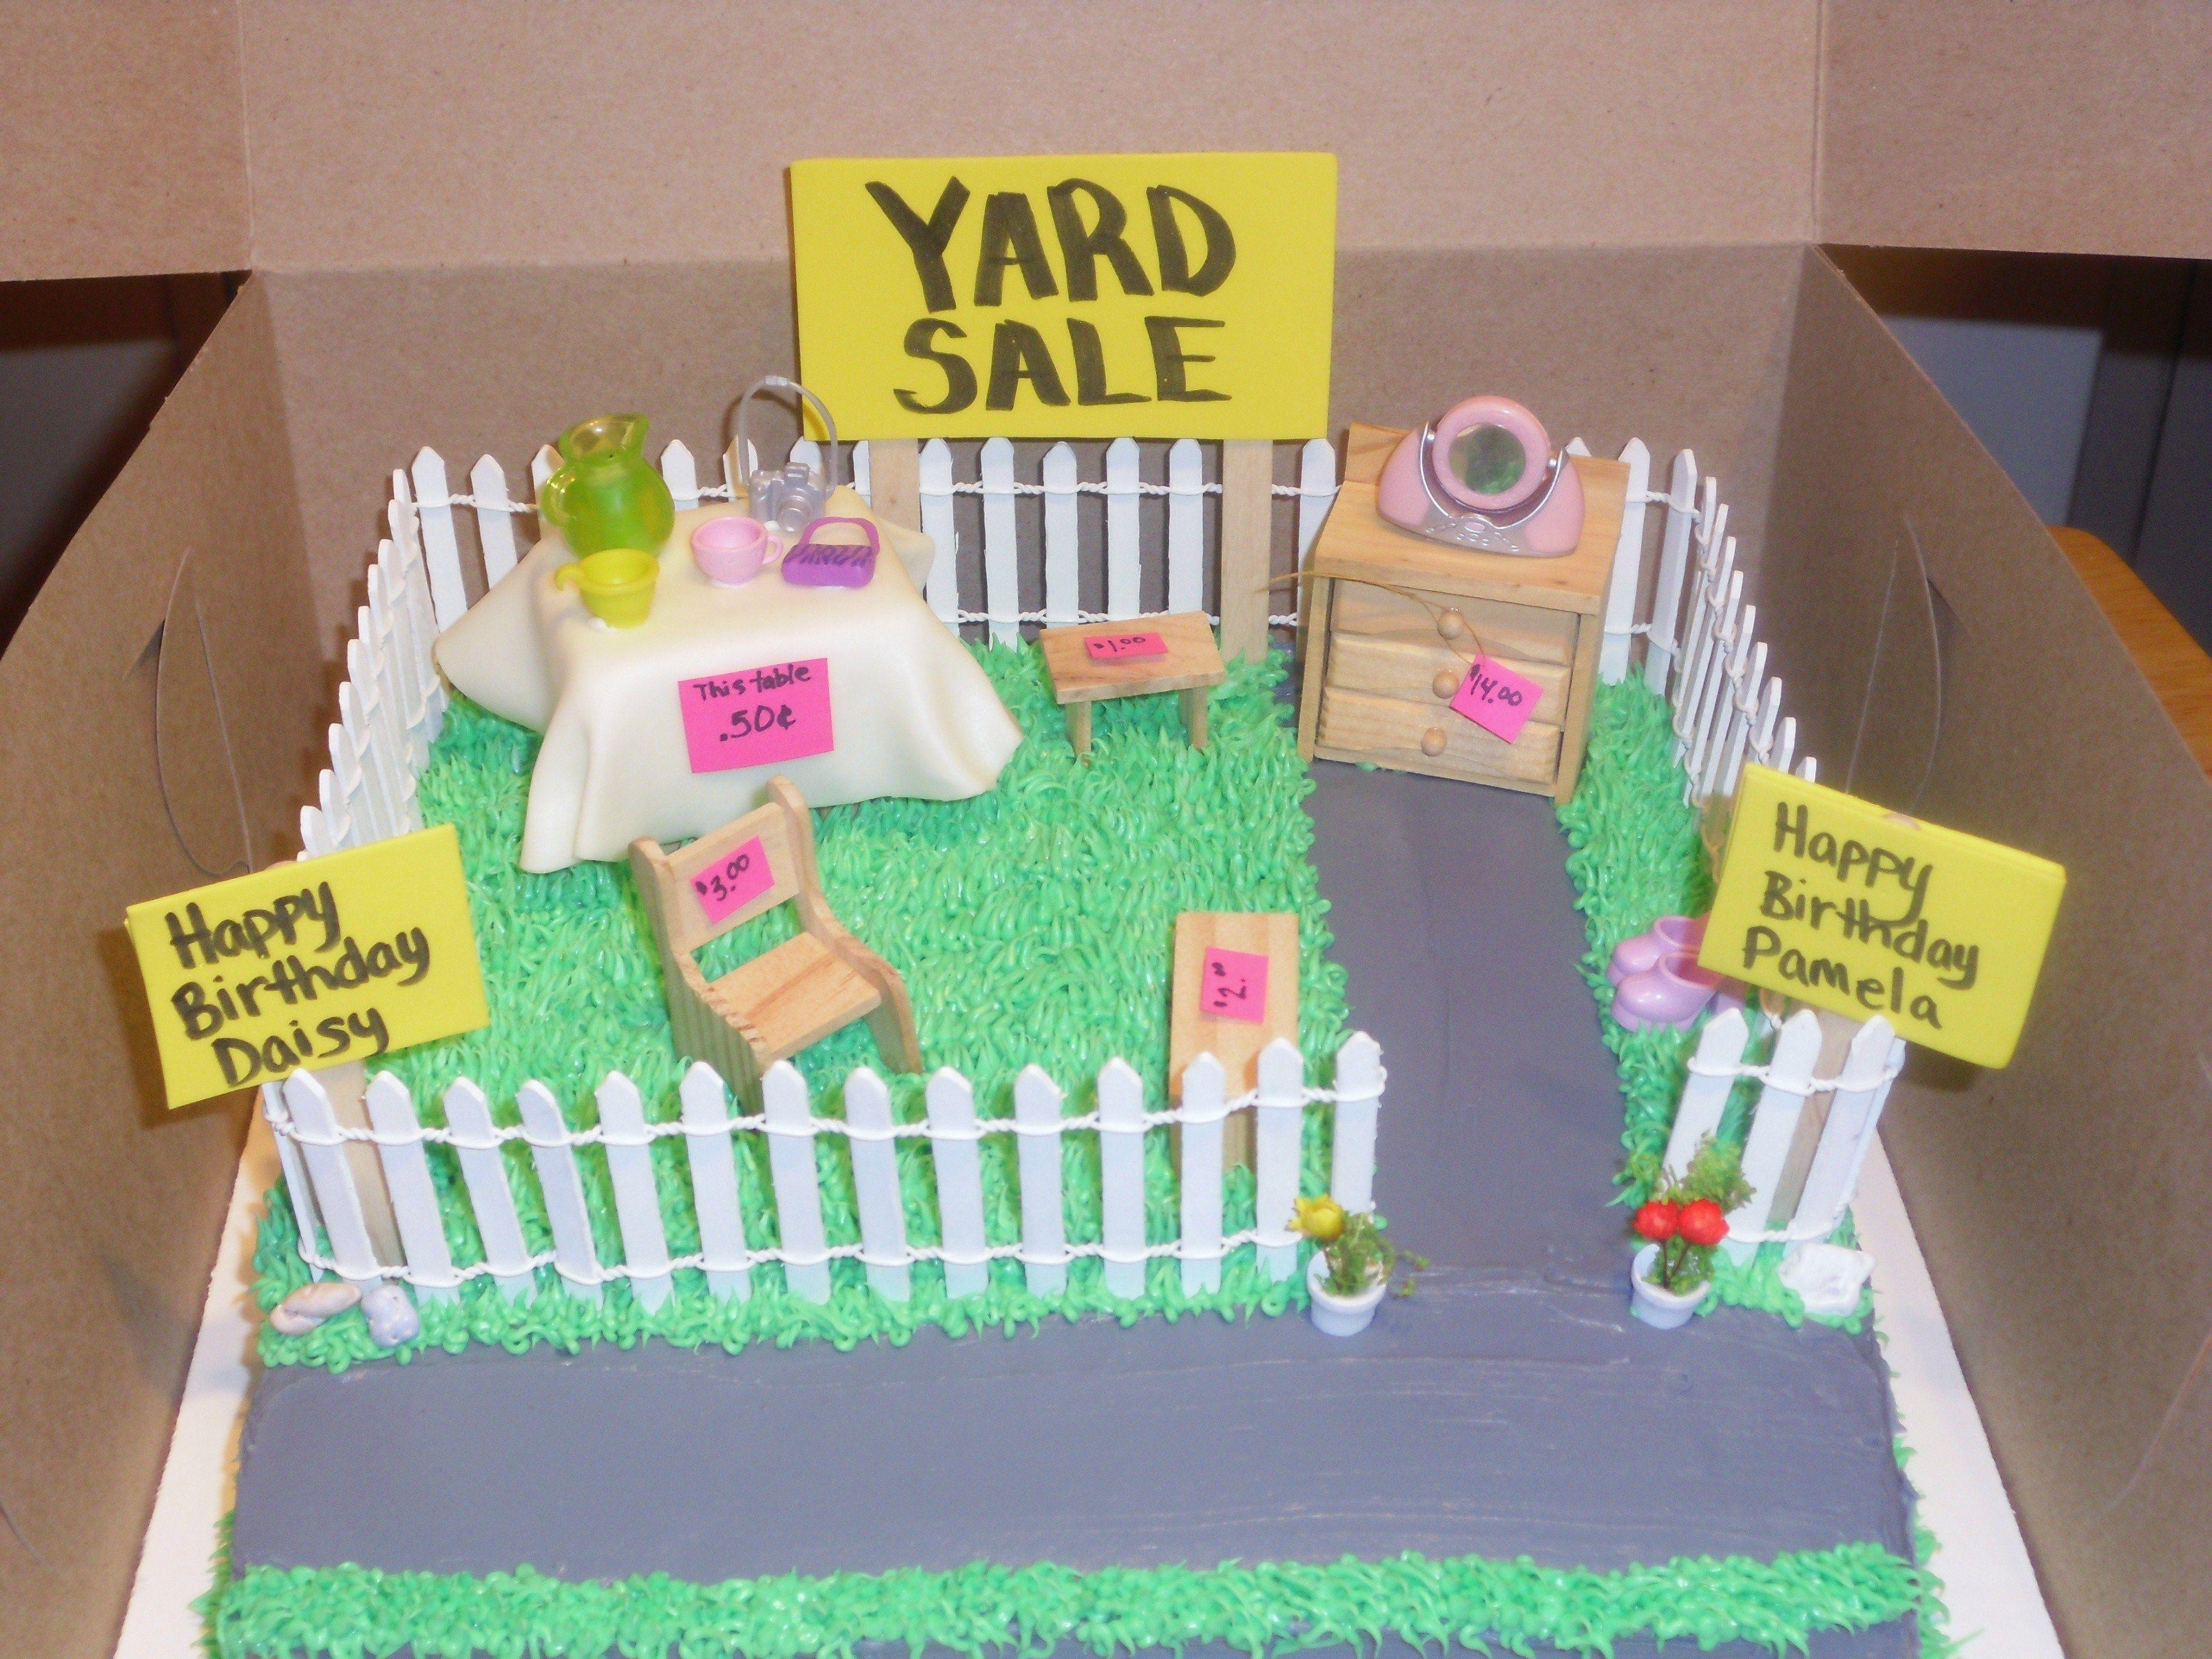 Yard Sale Birthday Cake Yard Sale Birthday Cake cupcakes